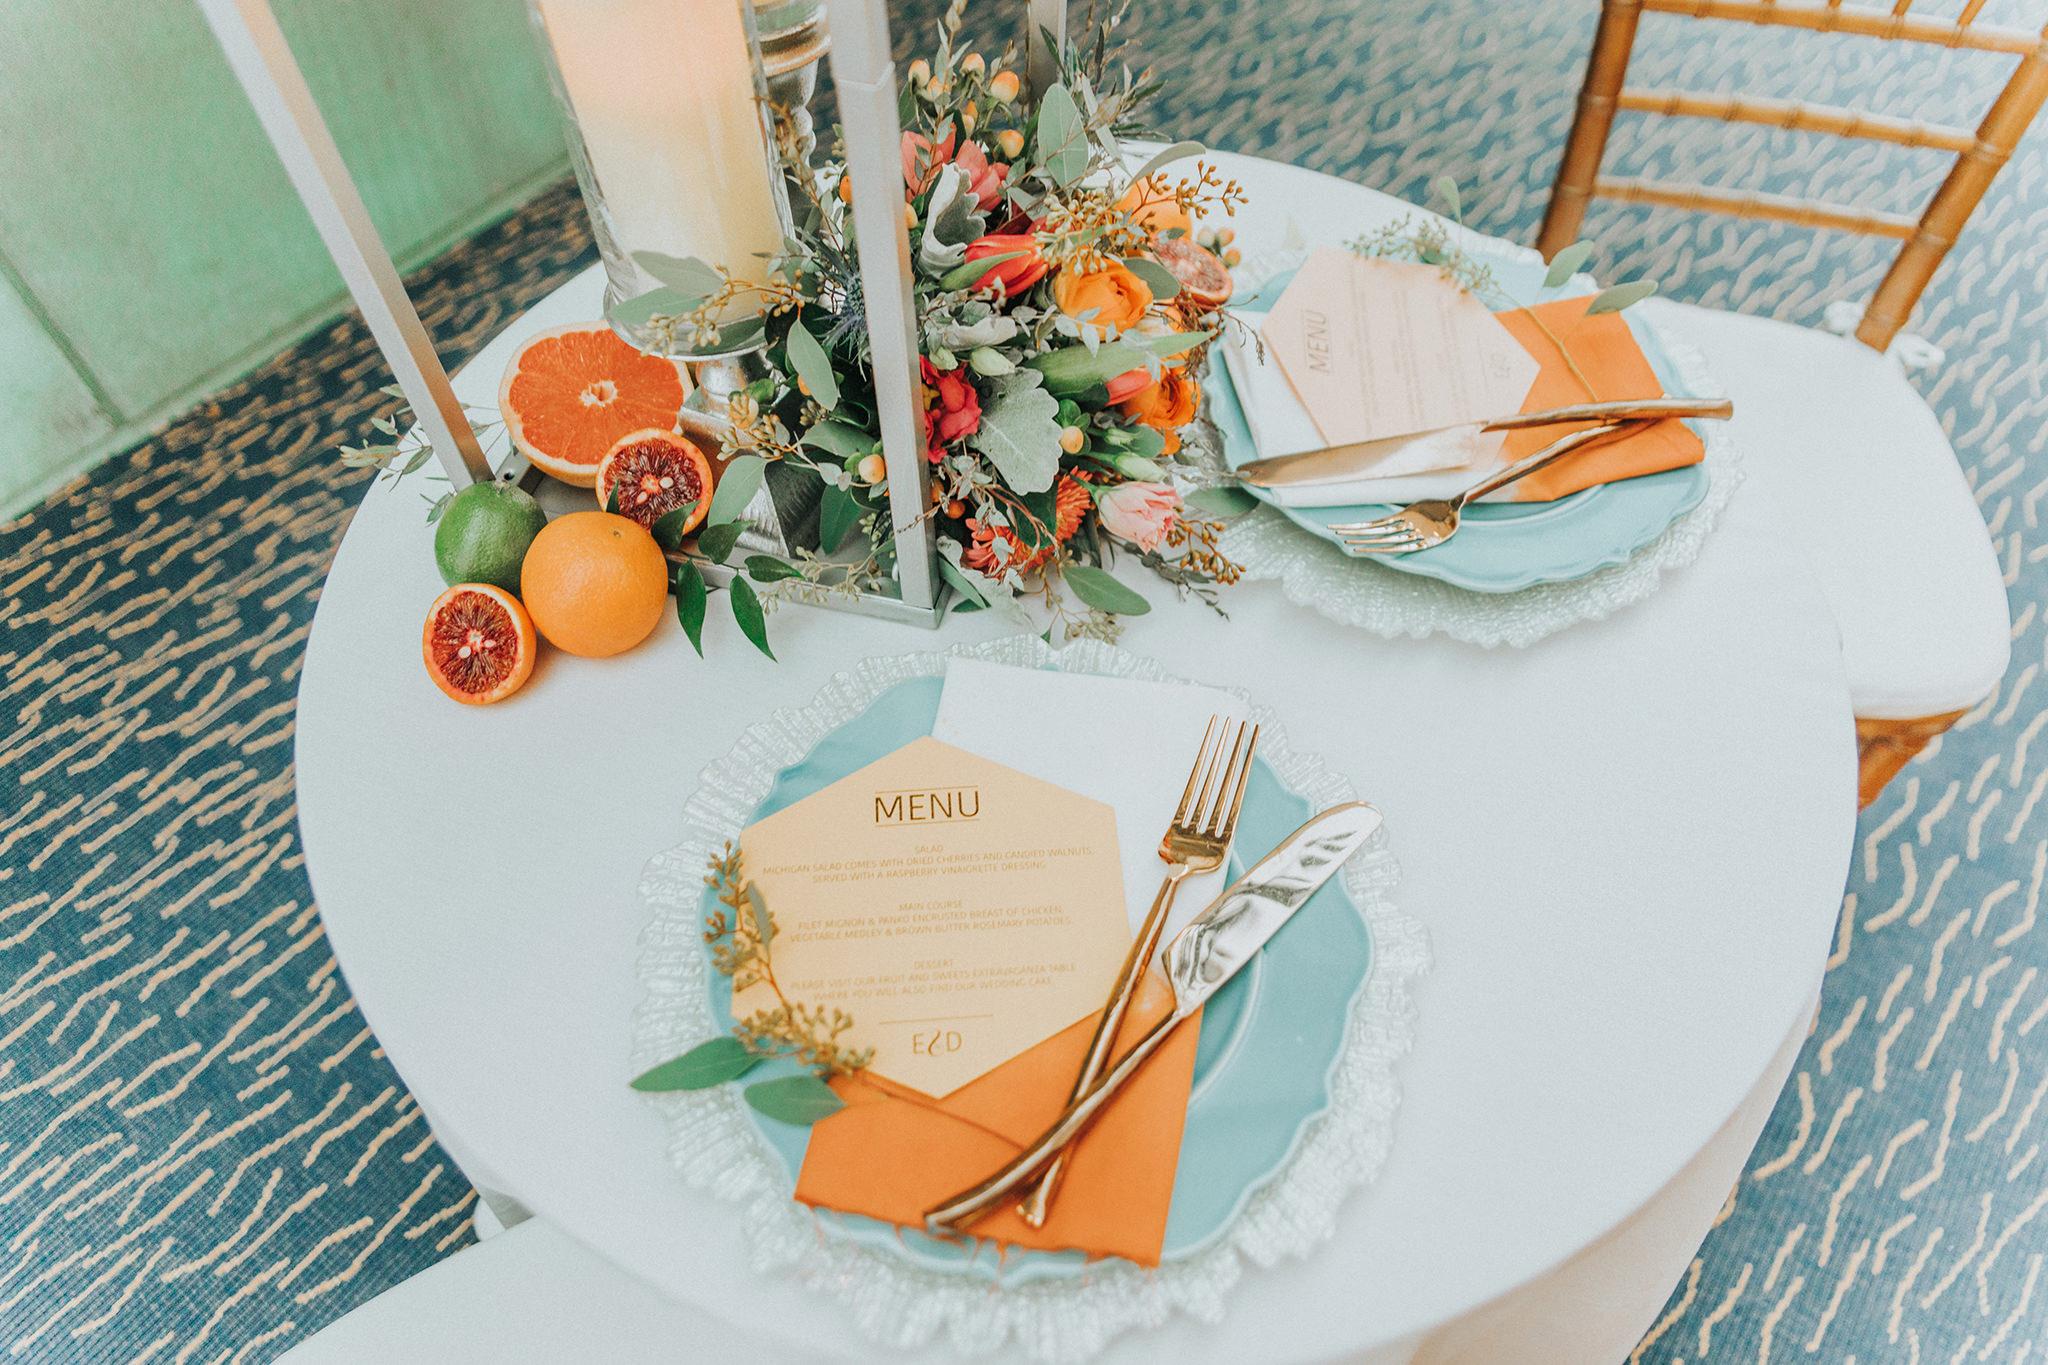 16omaha-wedding-photographer-planner-tiny-luxe-velvet-sage.jpg